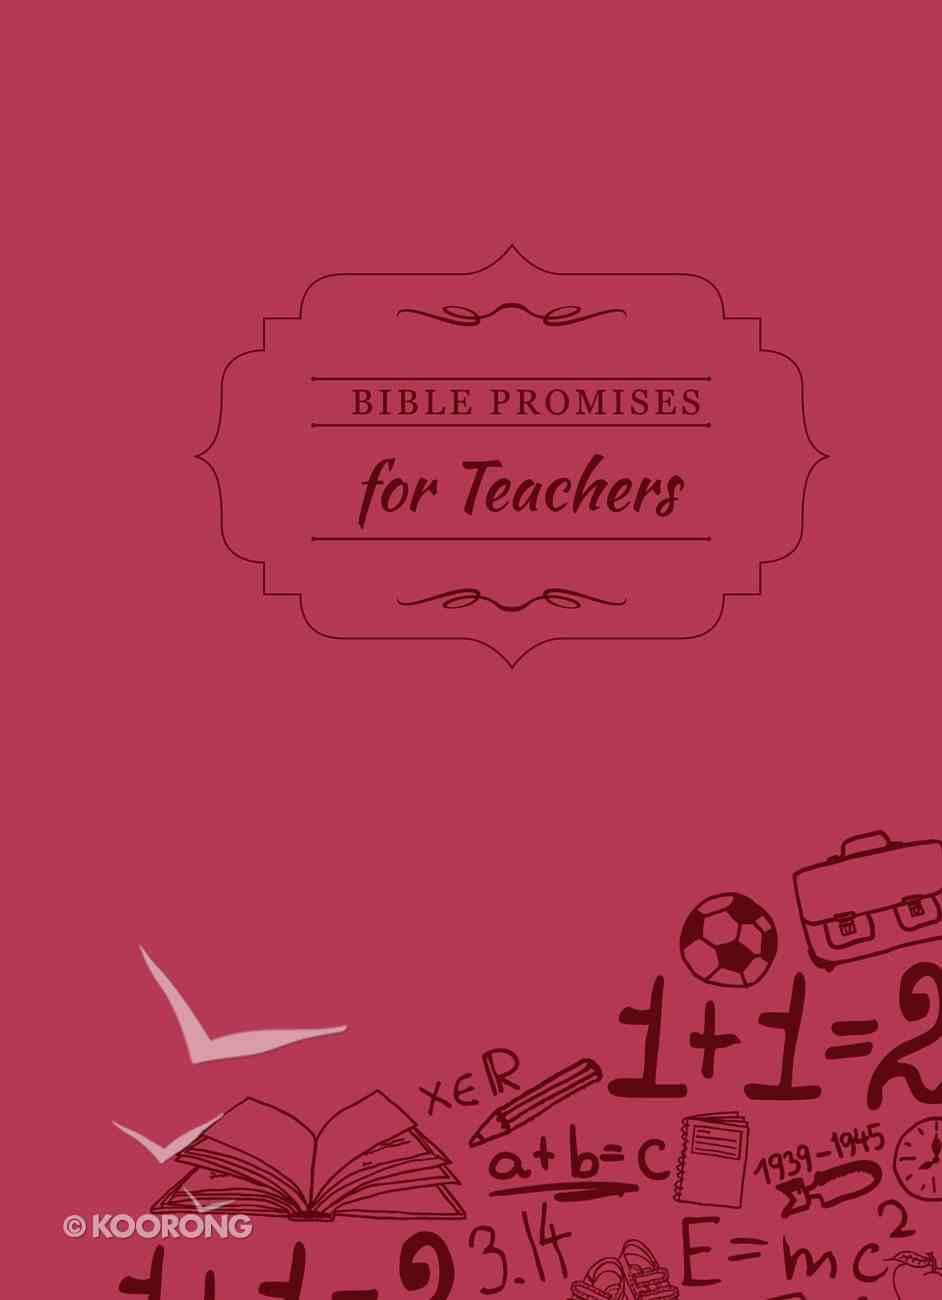 Bible Promises For Teachers (Bible Promises Series) eBook